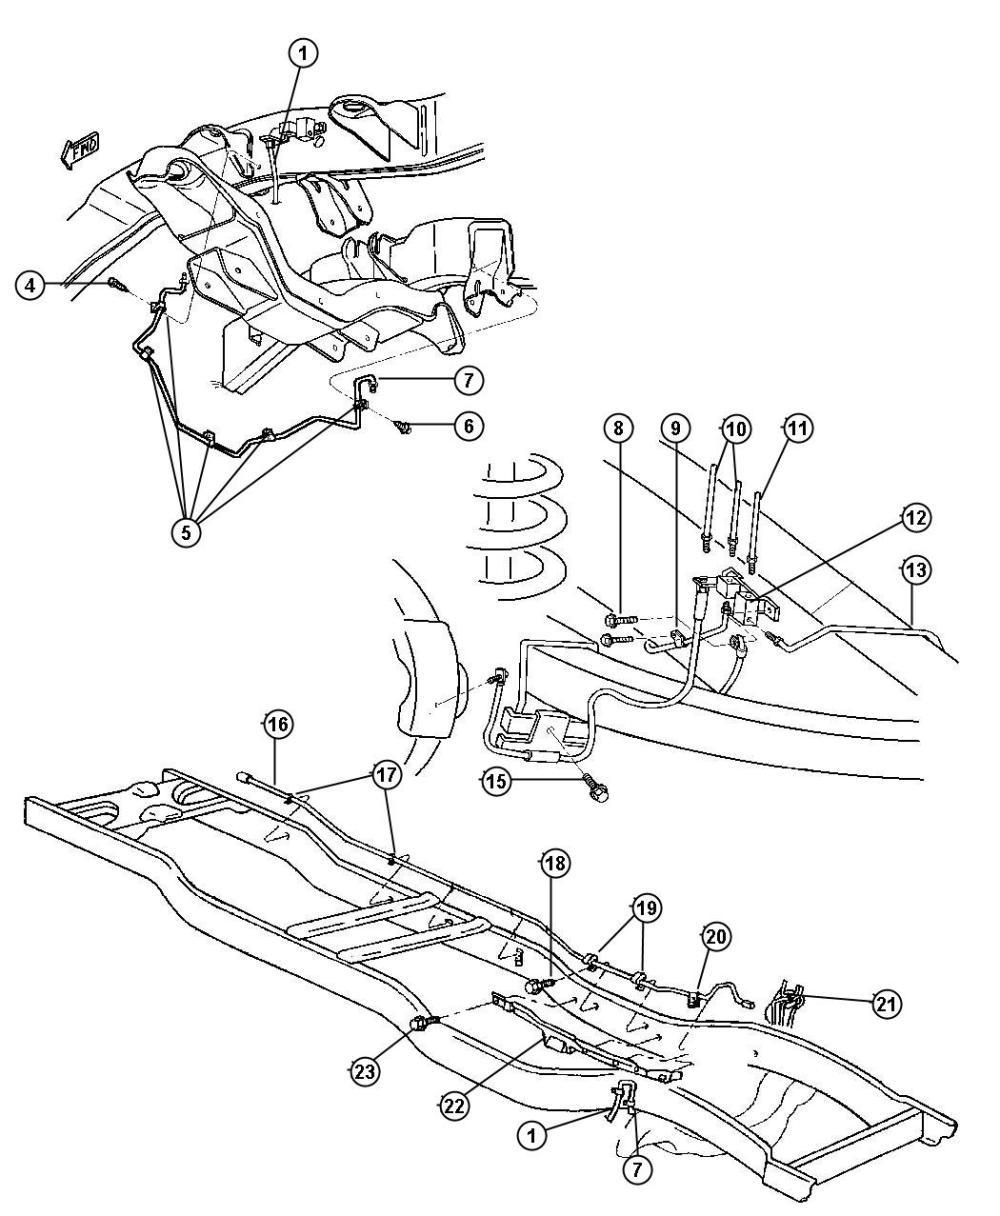 medium resolution of 2002 dodge ram 1500 5 9 firing order on 97 dodge 1500 wiring diagram